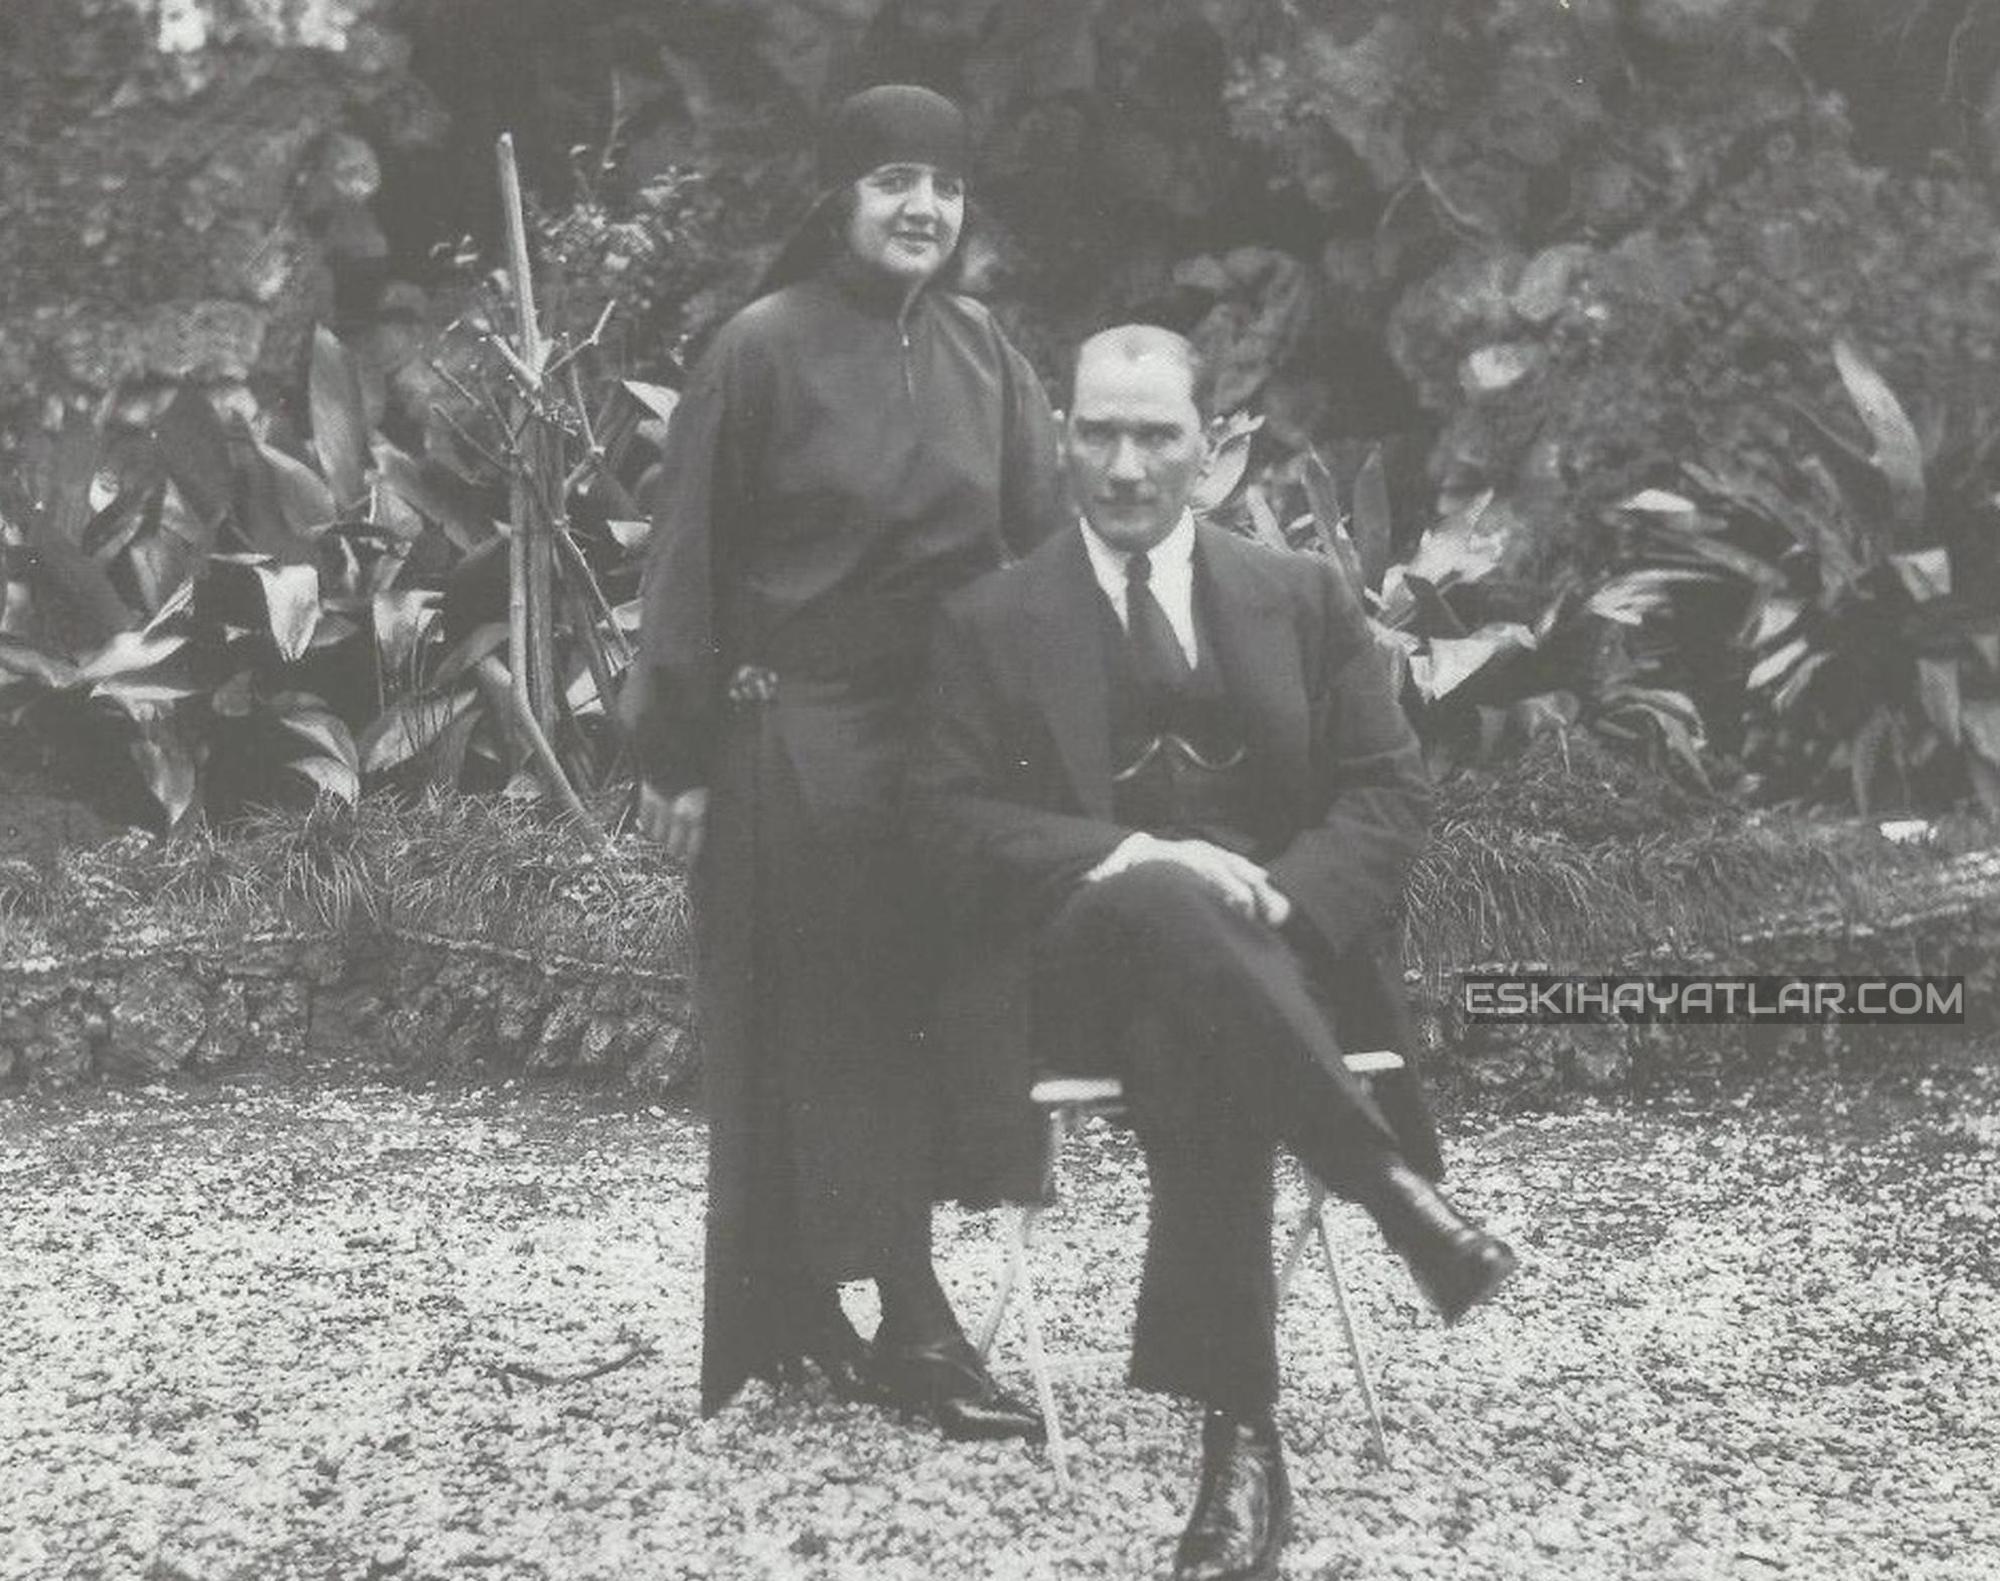 ataturk-izmir-gunleri-mustafa-kemal-pasa-1922-izmir-fotograflari (13)